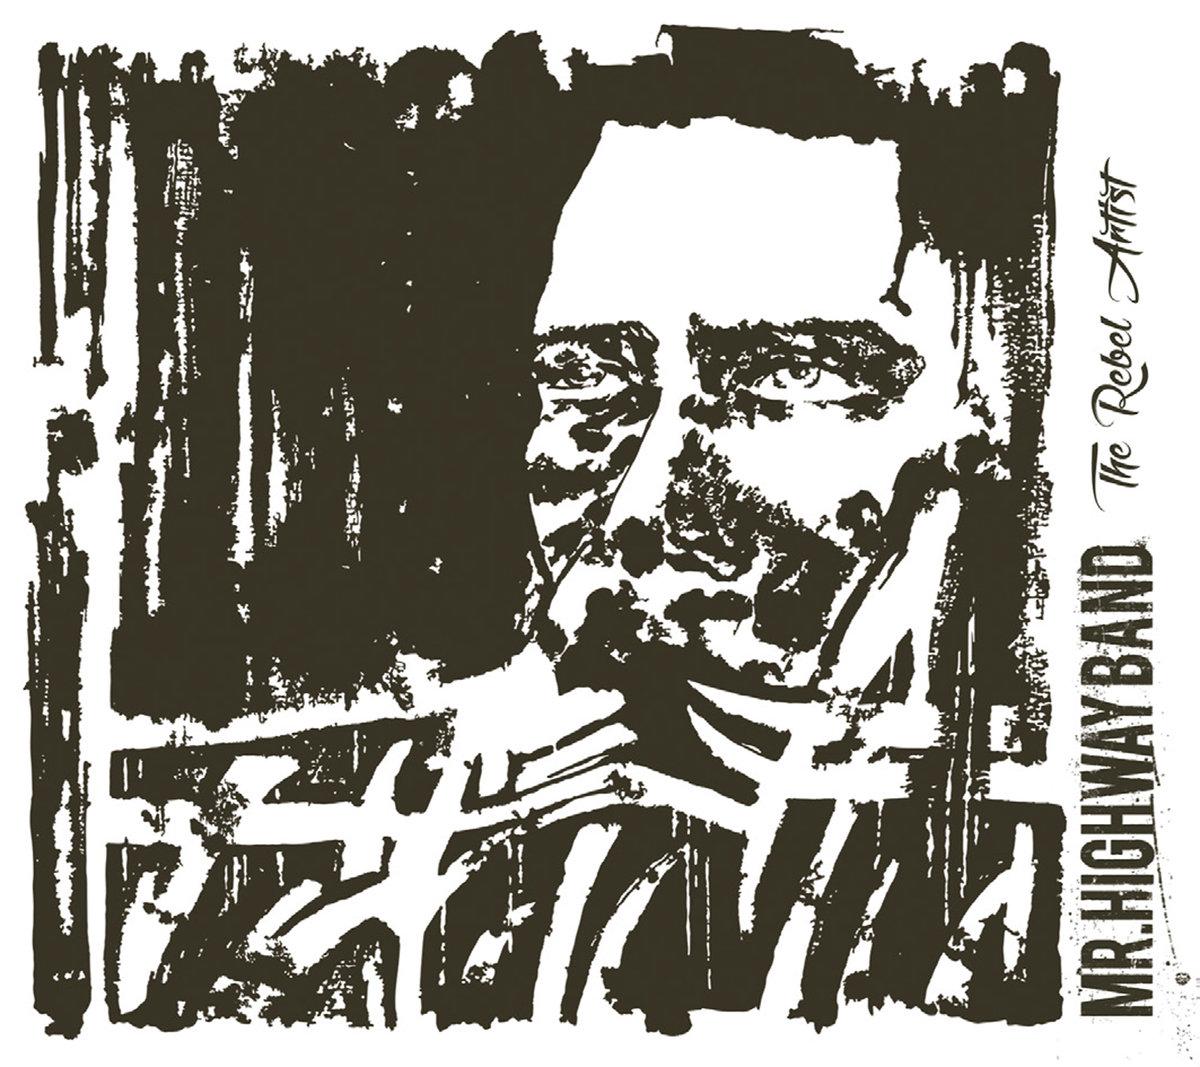 Applause clipart samba music. The rebel artist mr